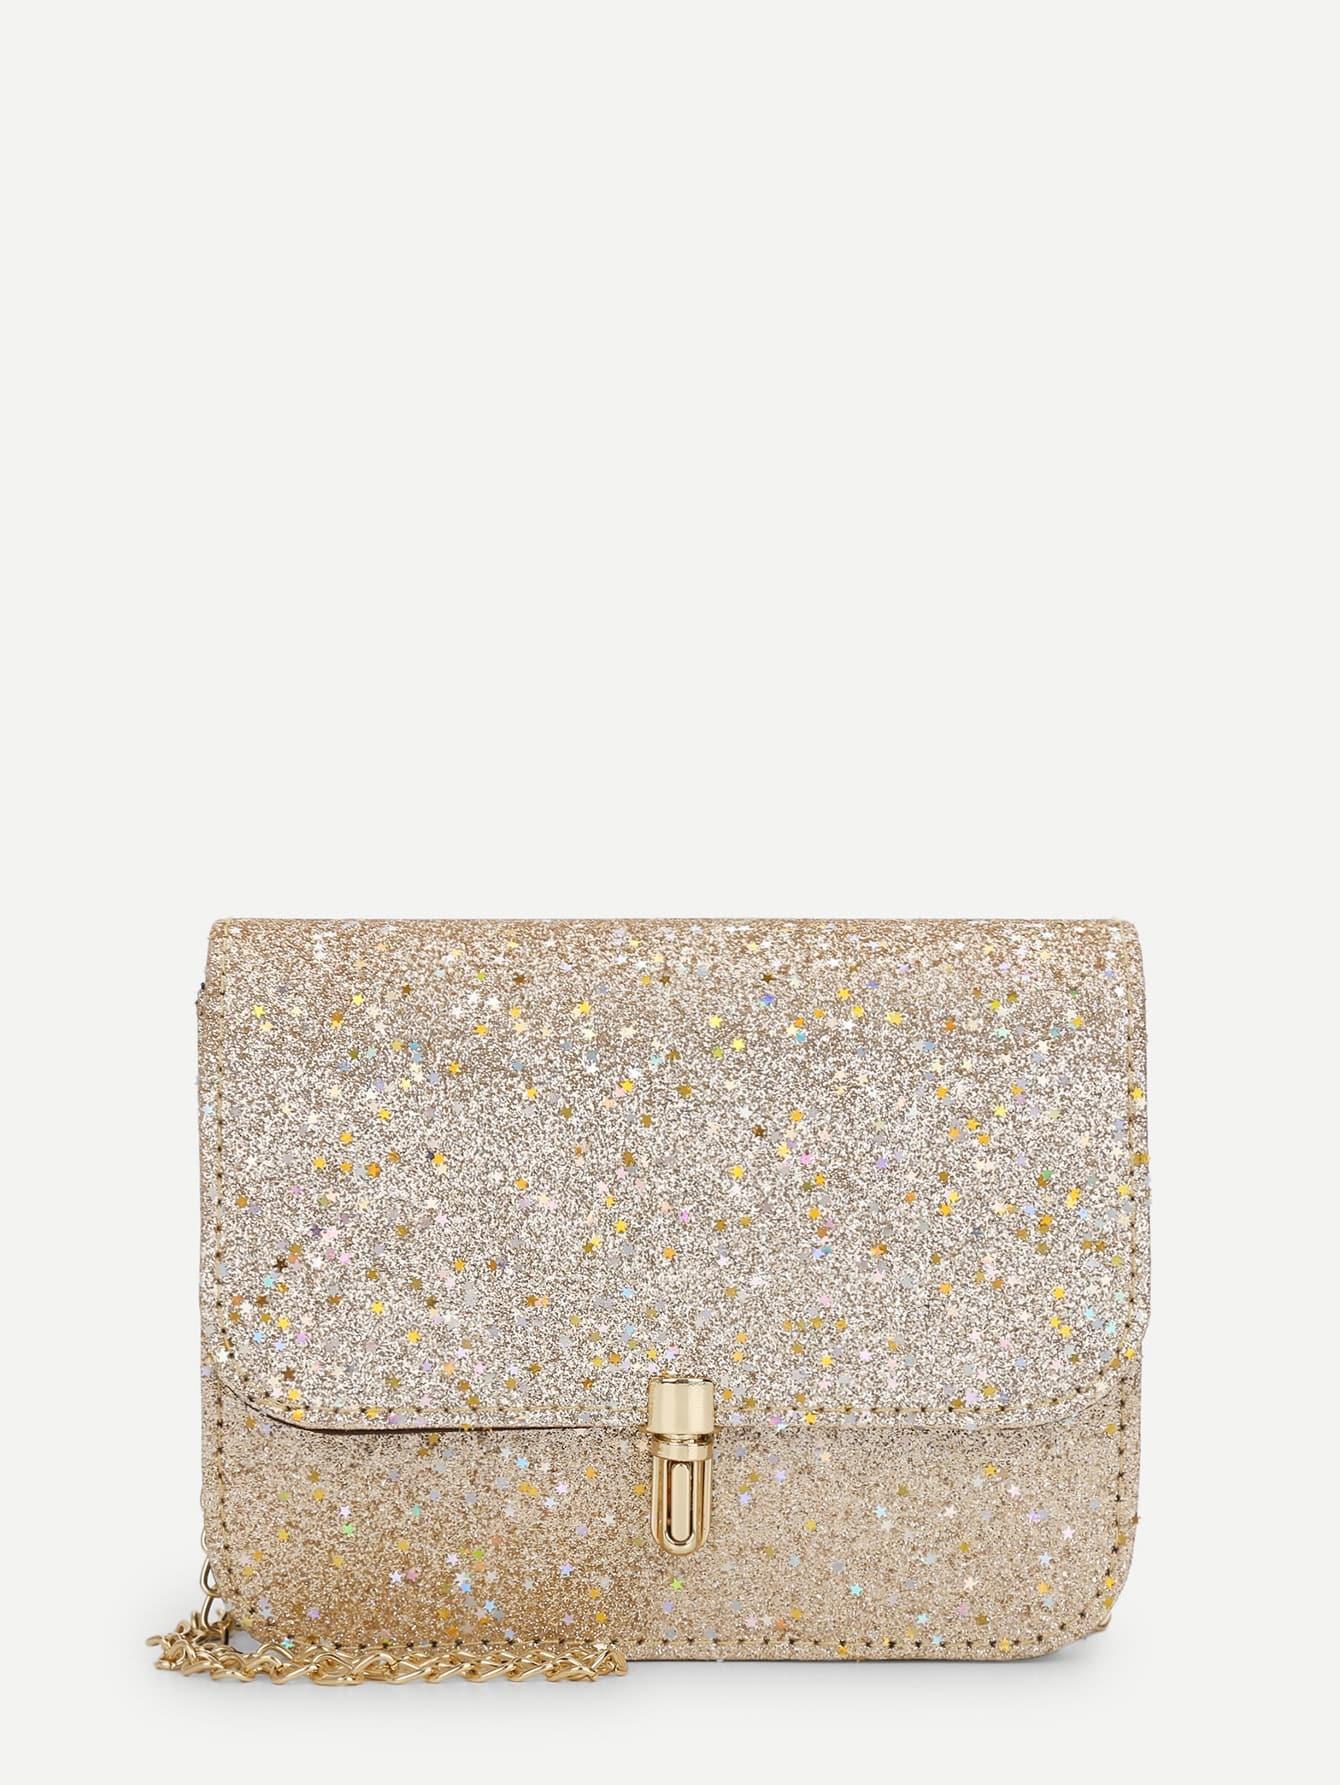 Glitter Star Design Flap Chain Crossbody Bag star detail glitter crossbody bag